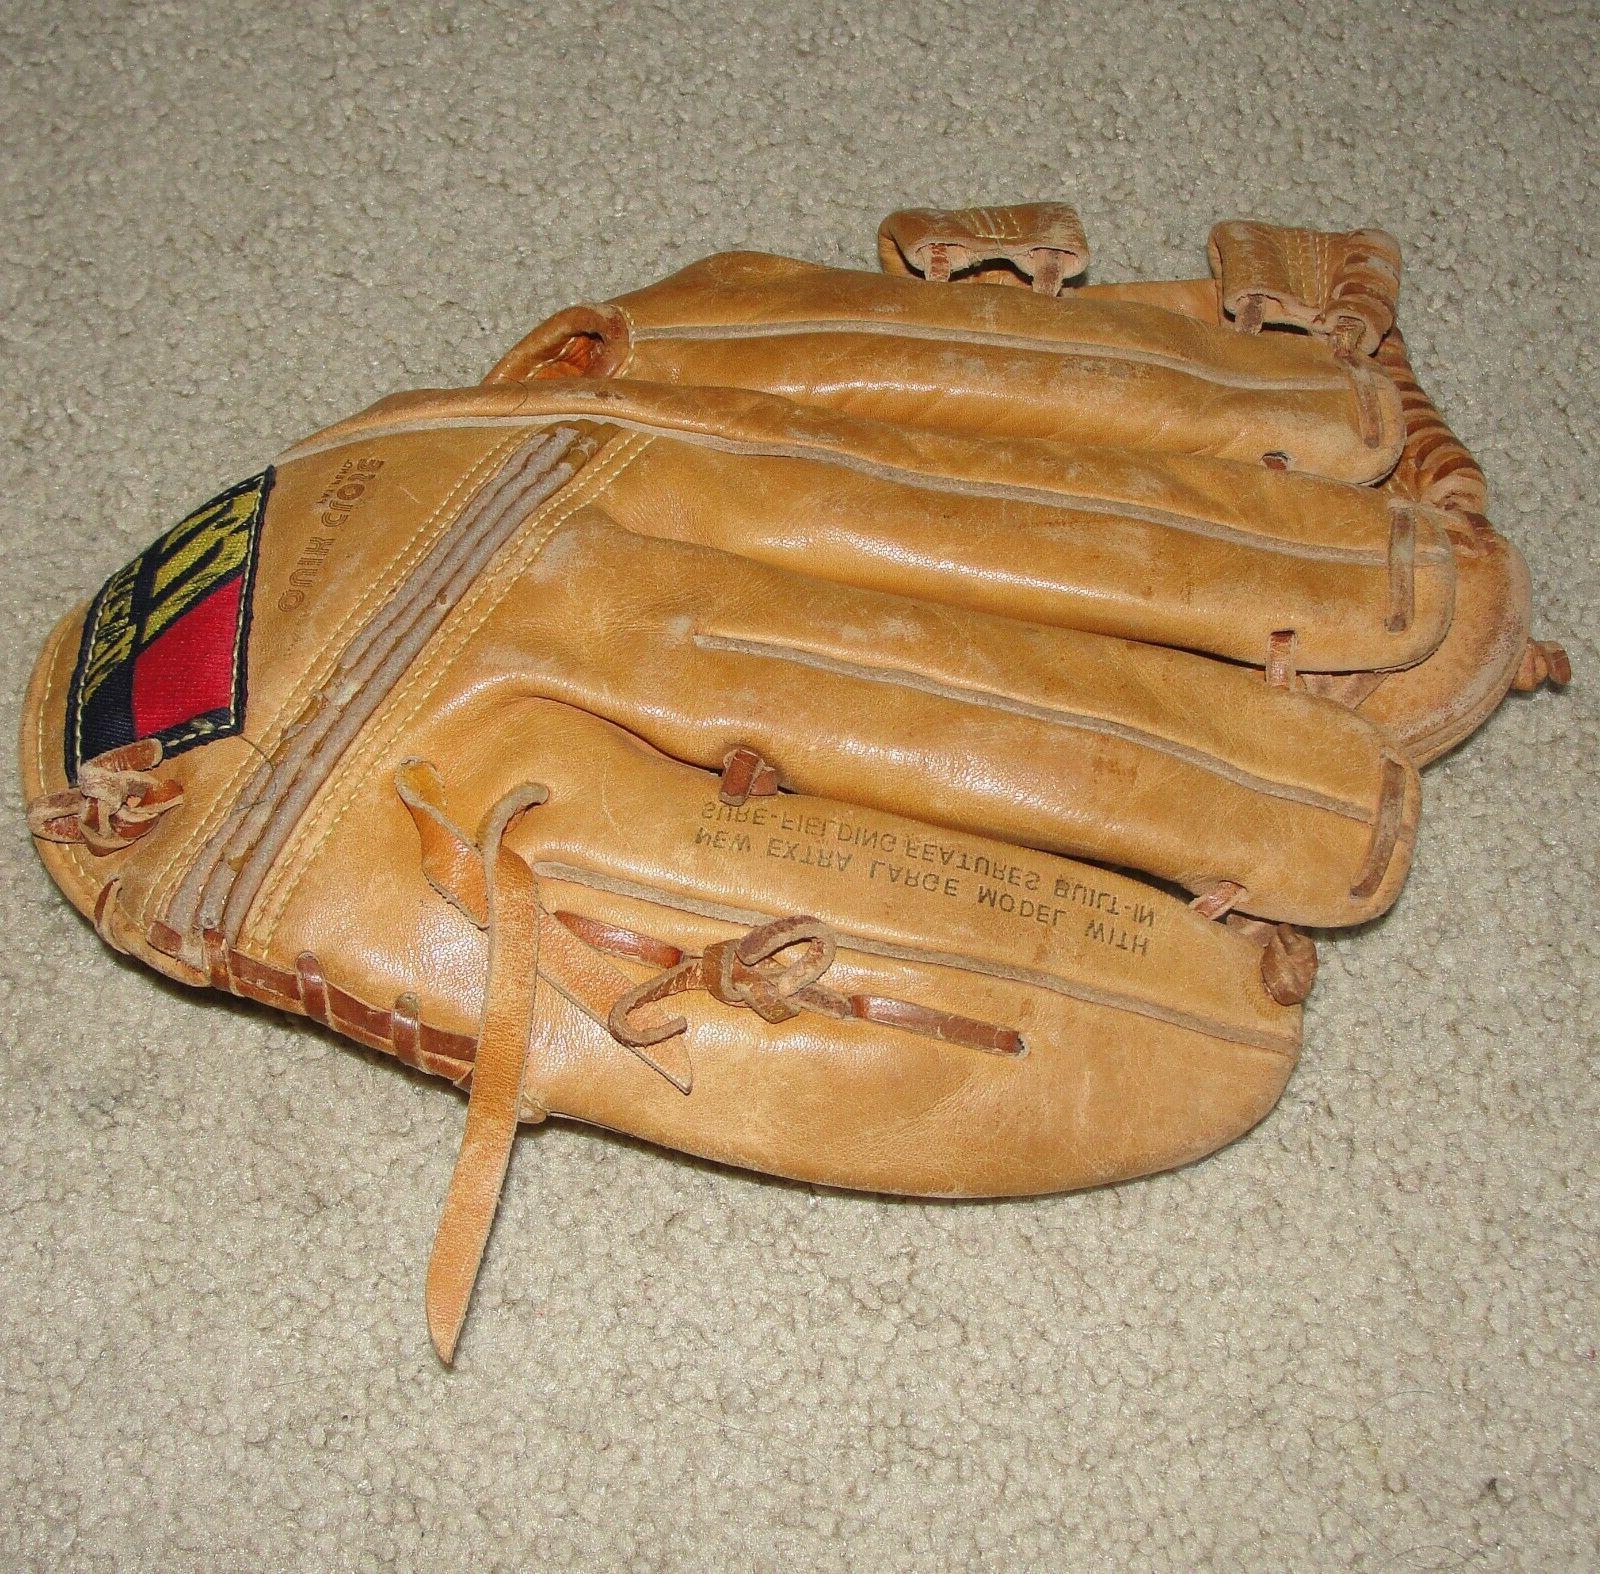 Mizuno Flex MTS-1 Leather PAT.PEND Hinge